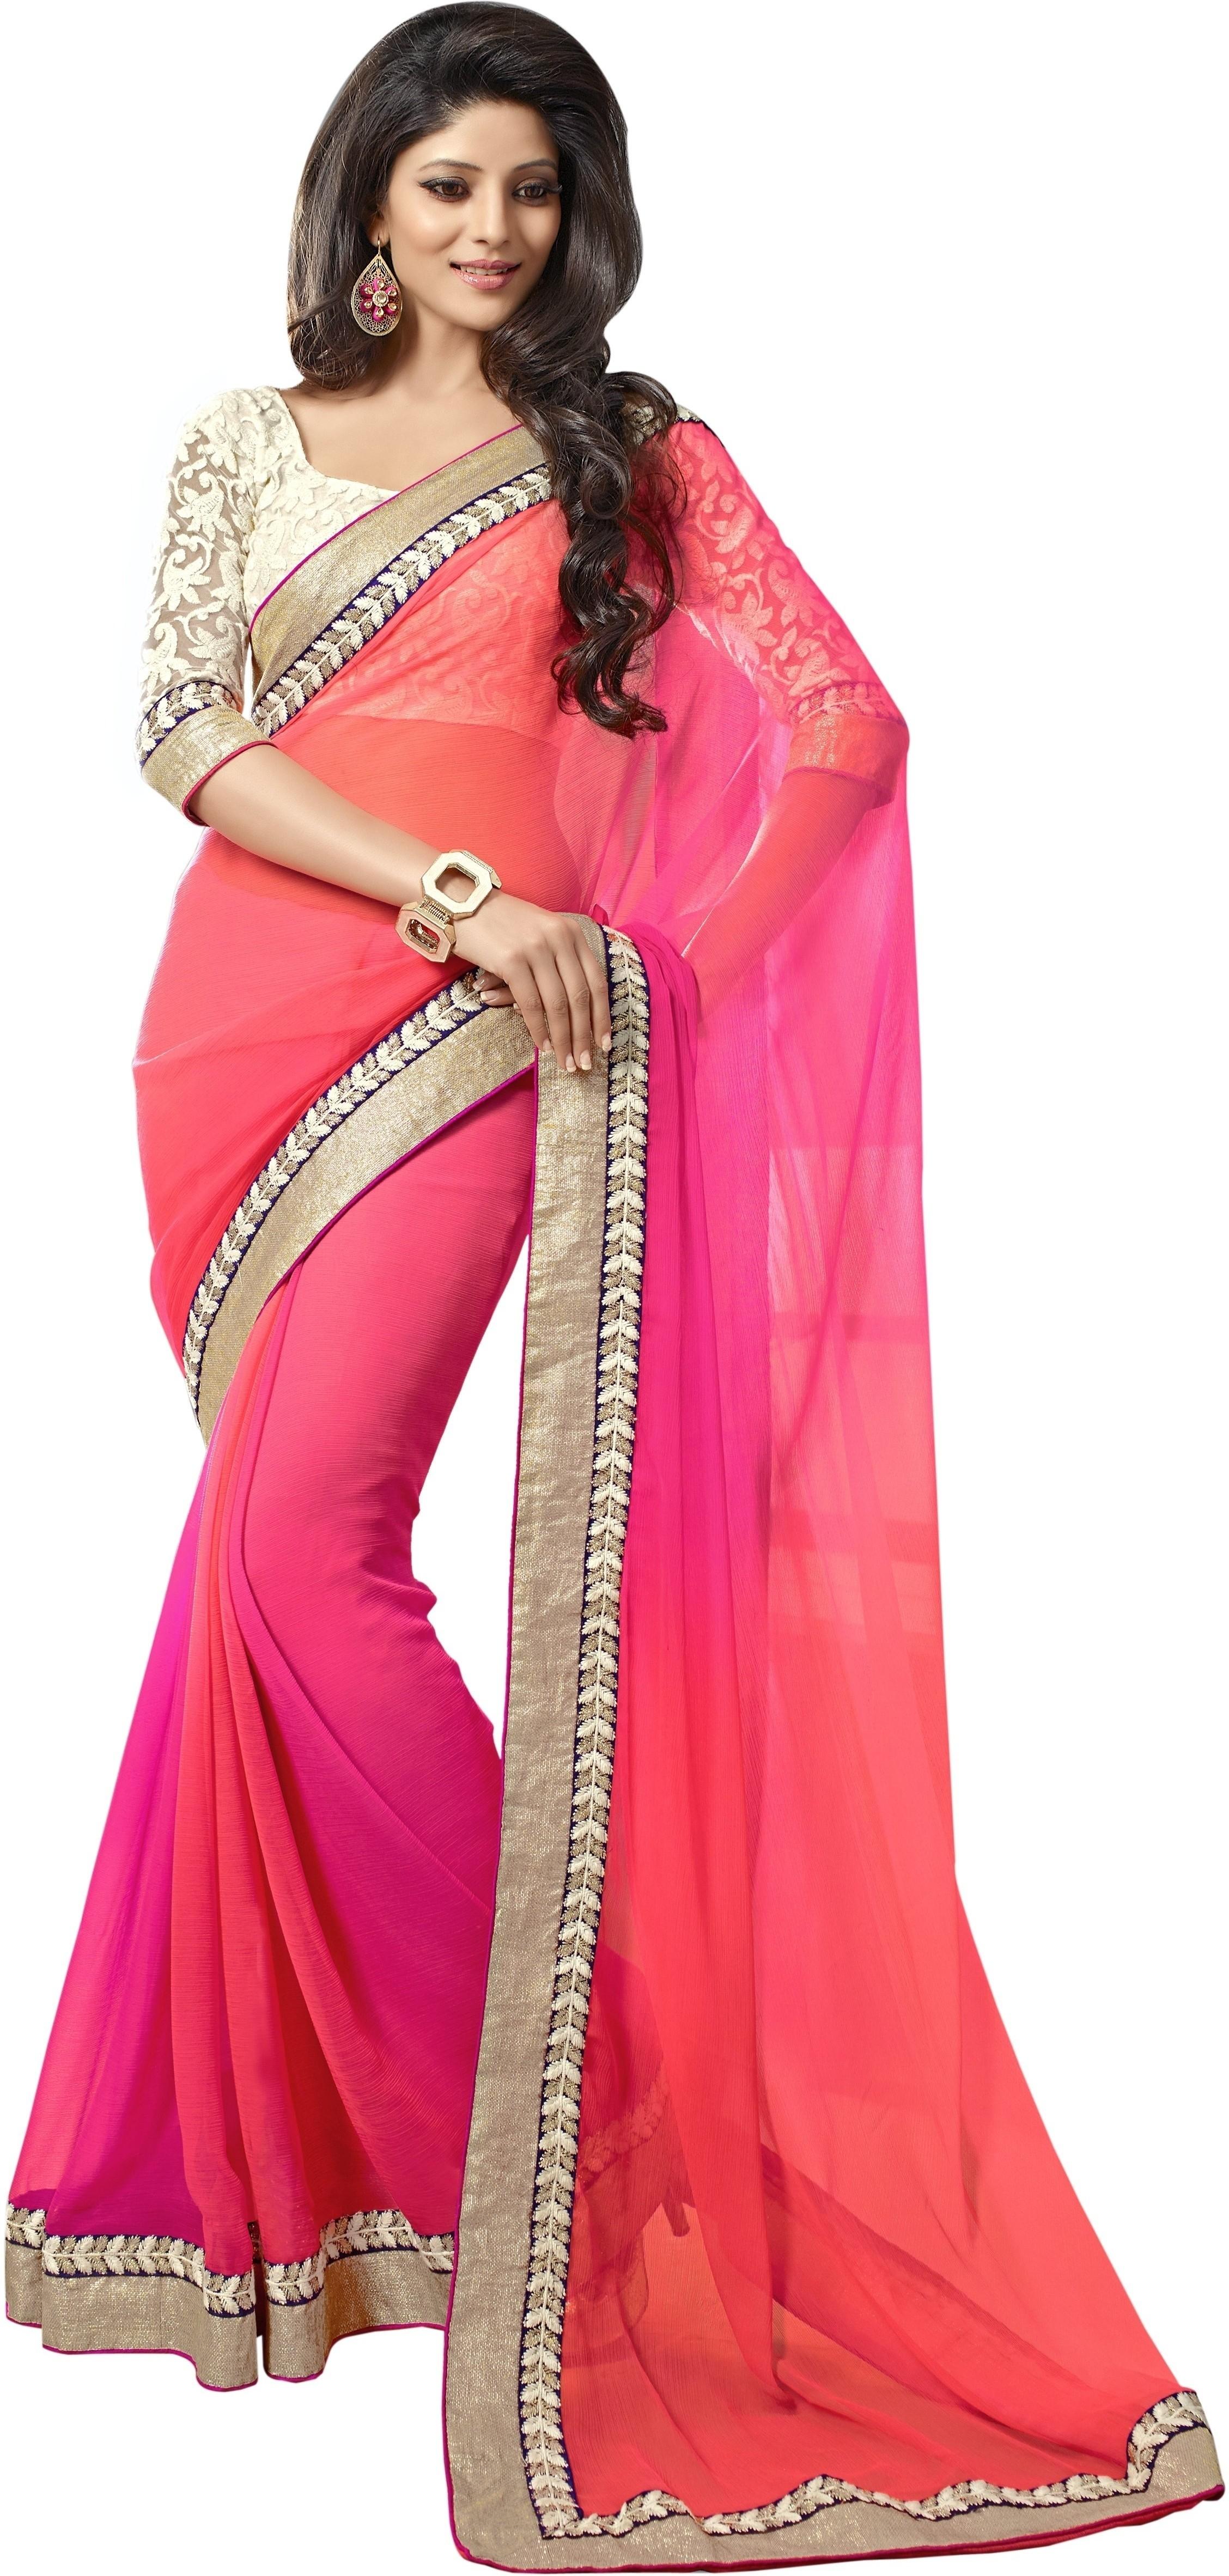 Gehna Saree Self Design Fashion Georgette Sari - Buy Pink ...